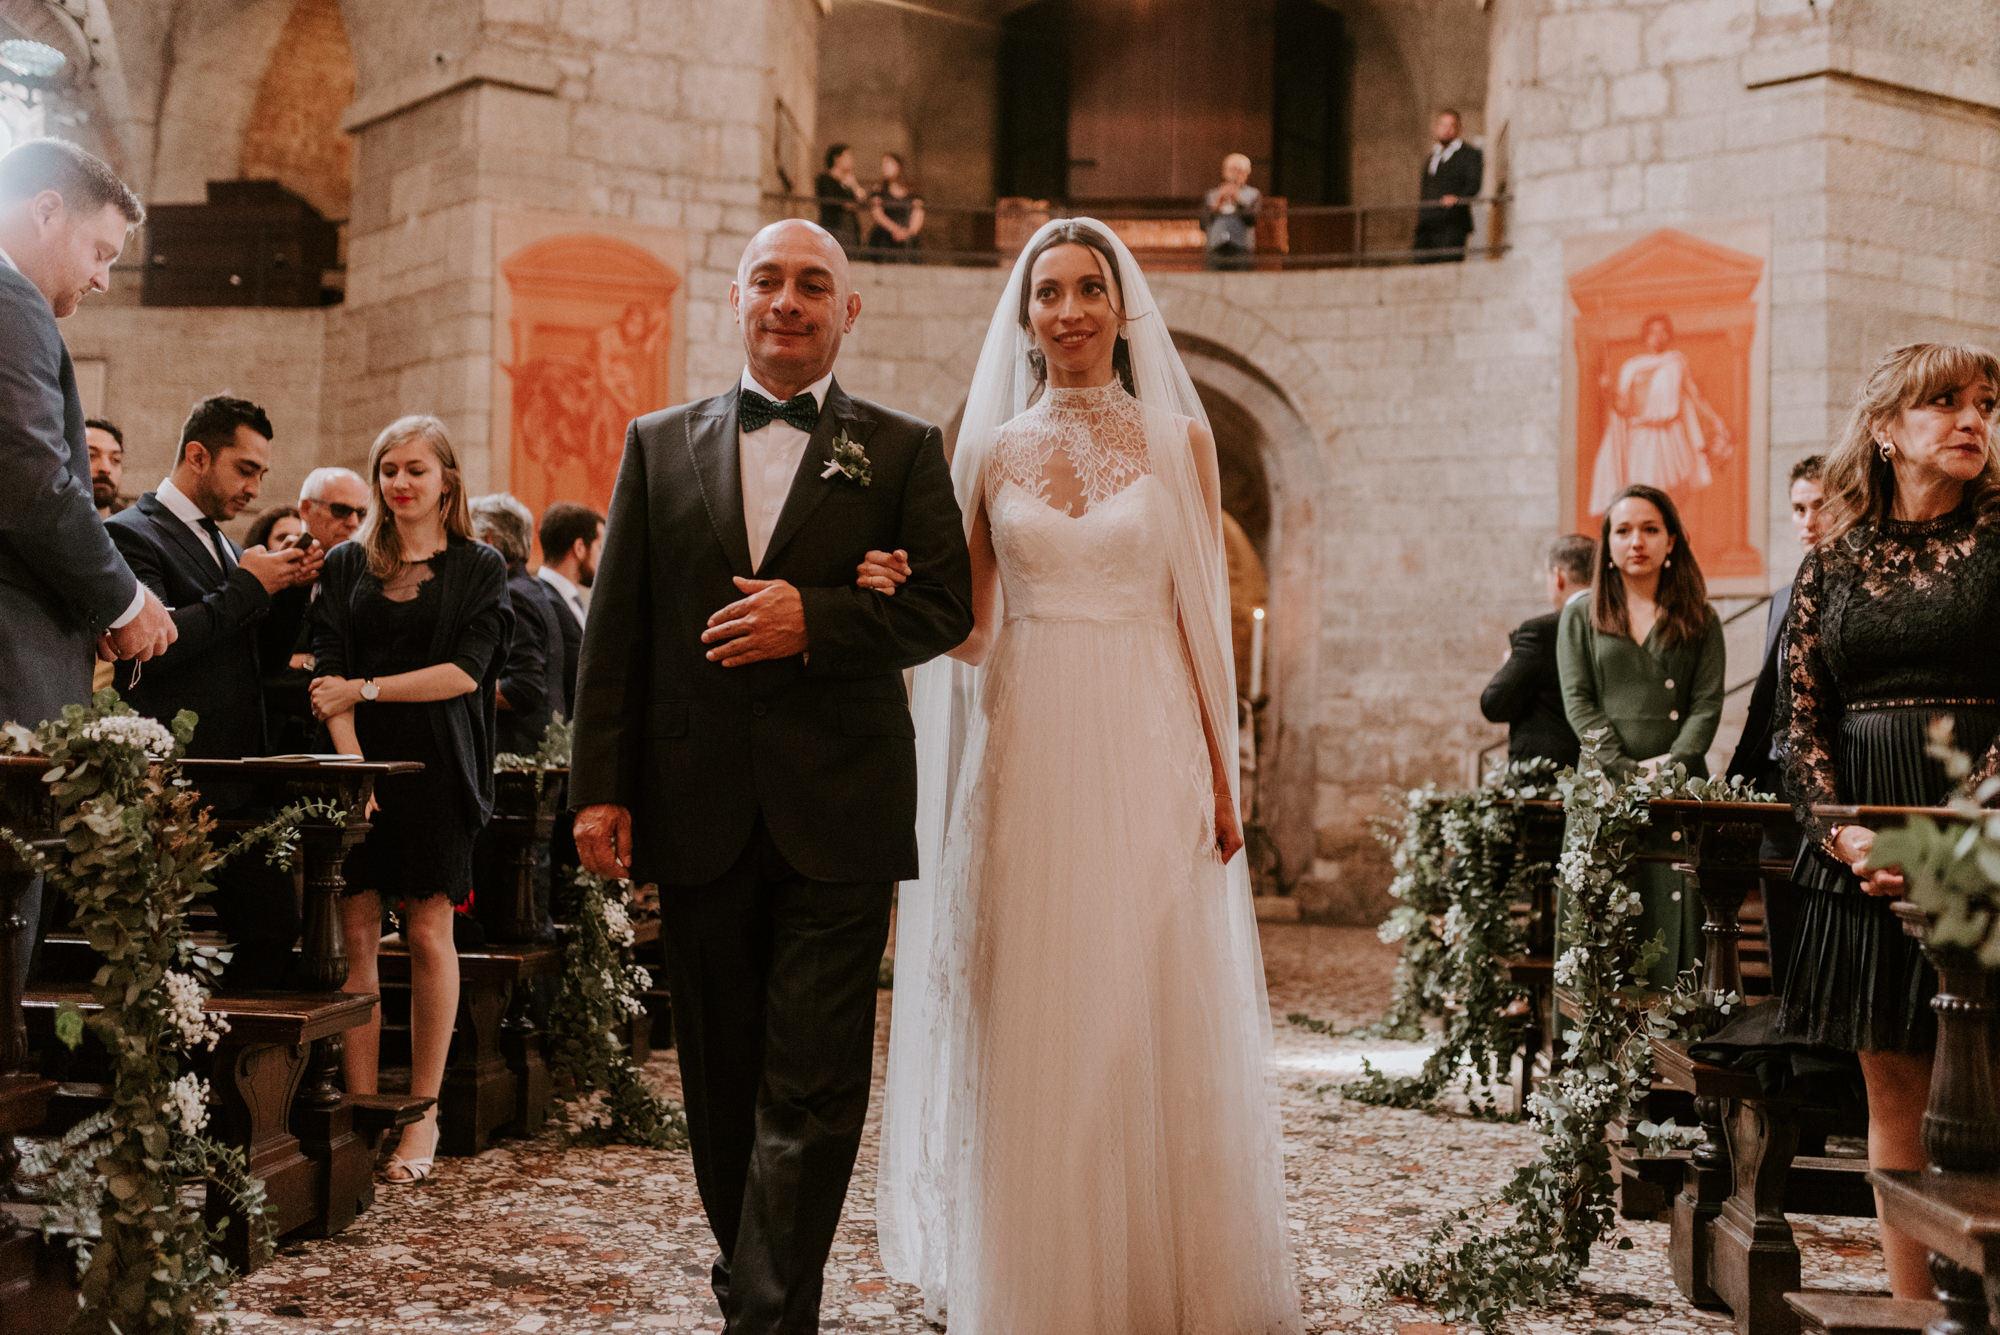 FOTO+PHOTO+BODA+WEDDING+ITALIA+ITALY+MAURICIO+GARAY+MAURICIOGARAY+WEDDINPHOTOGRAPHER+FOTOGRAFODEBODA-757.jpg